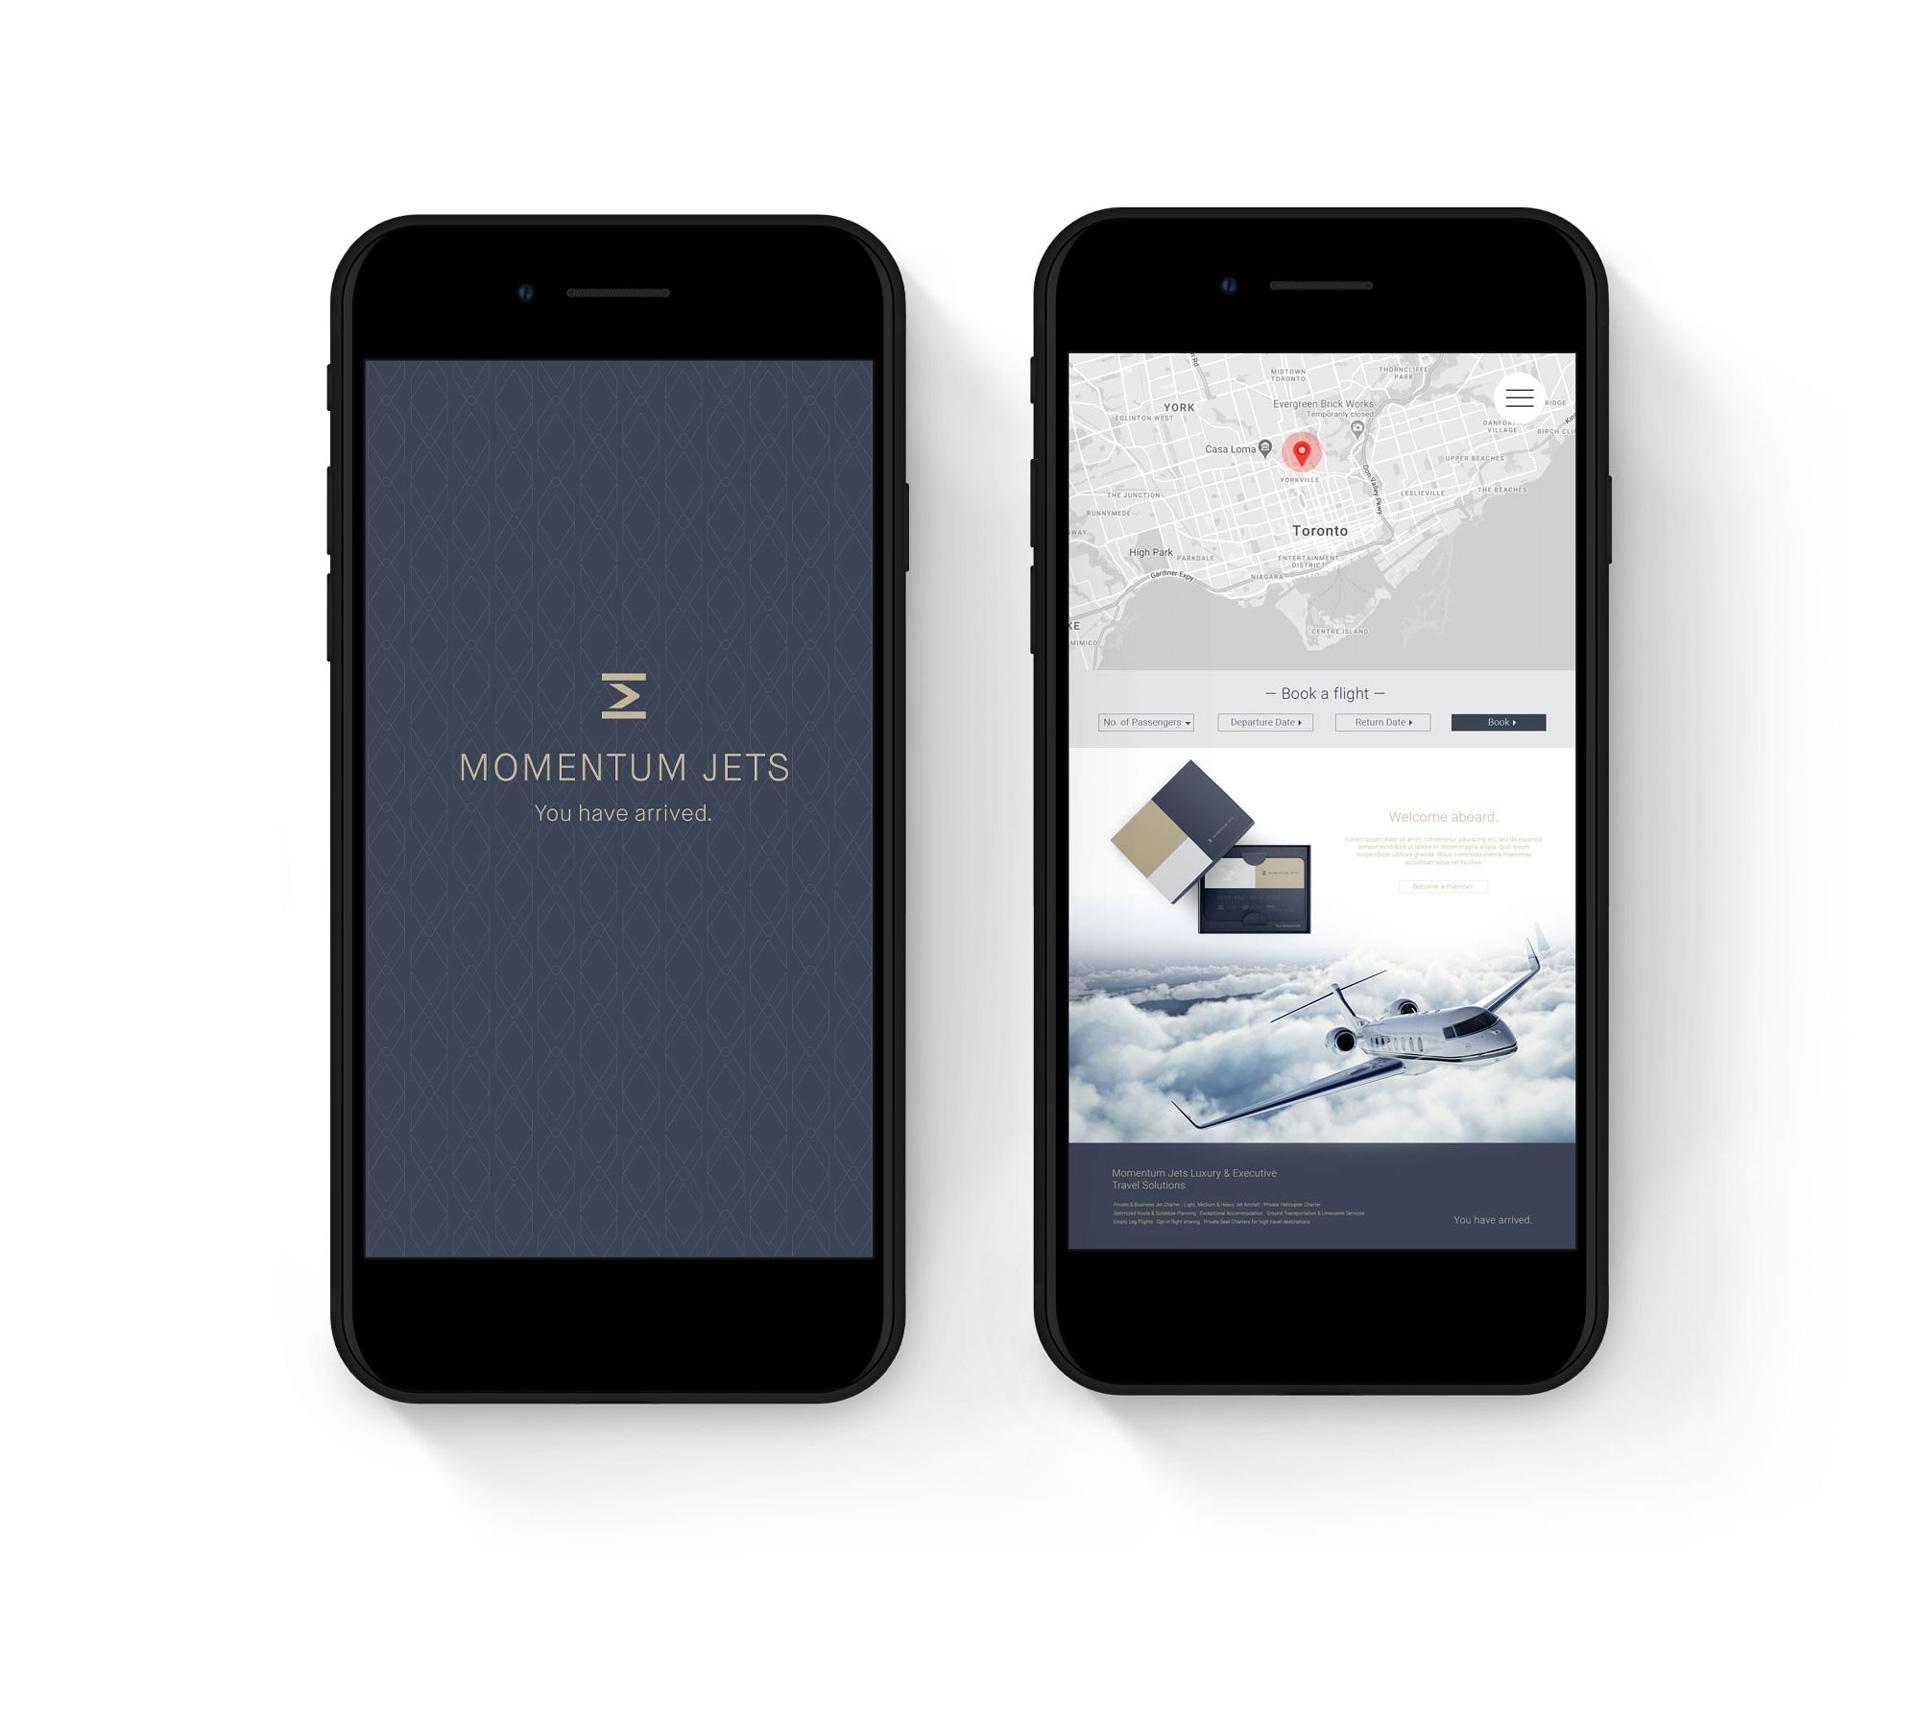 Momentum Jets app design